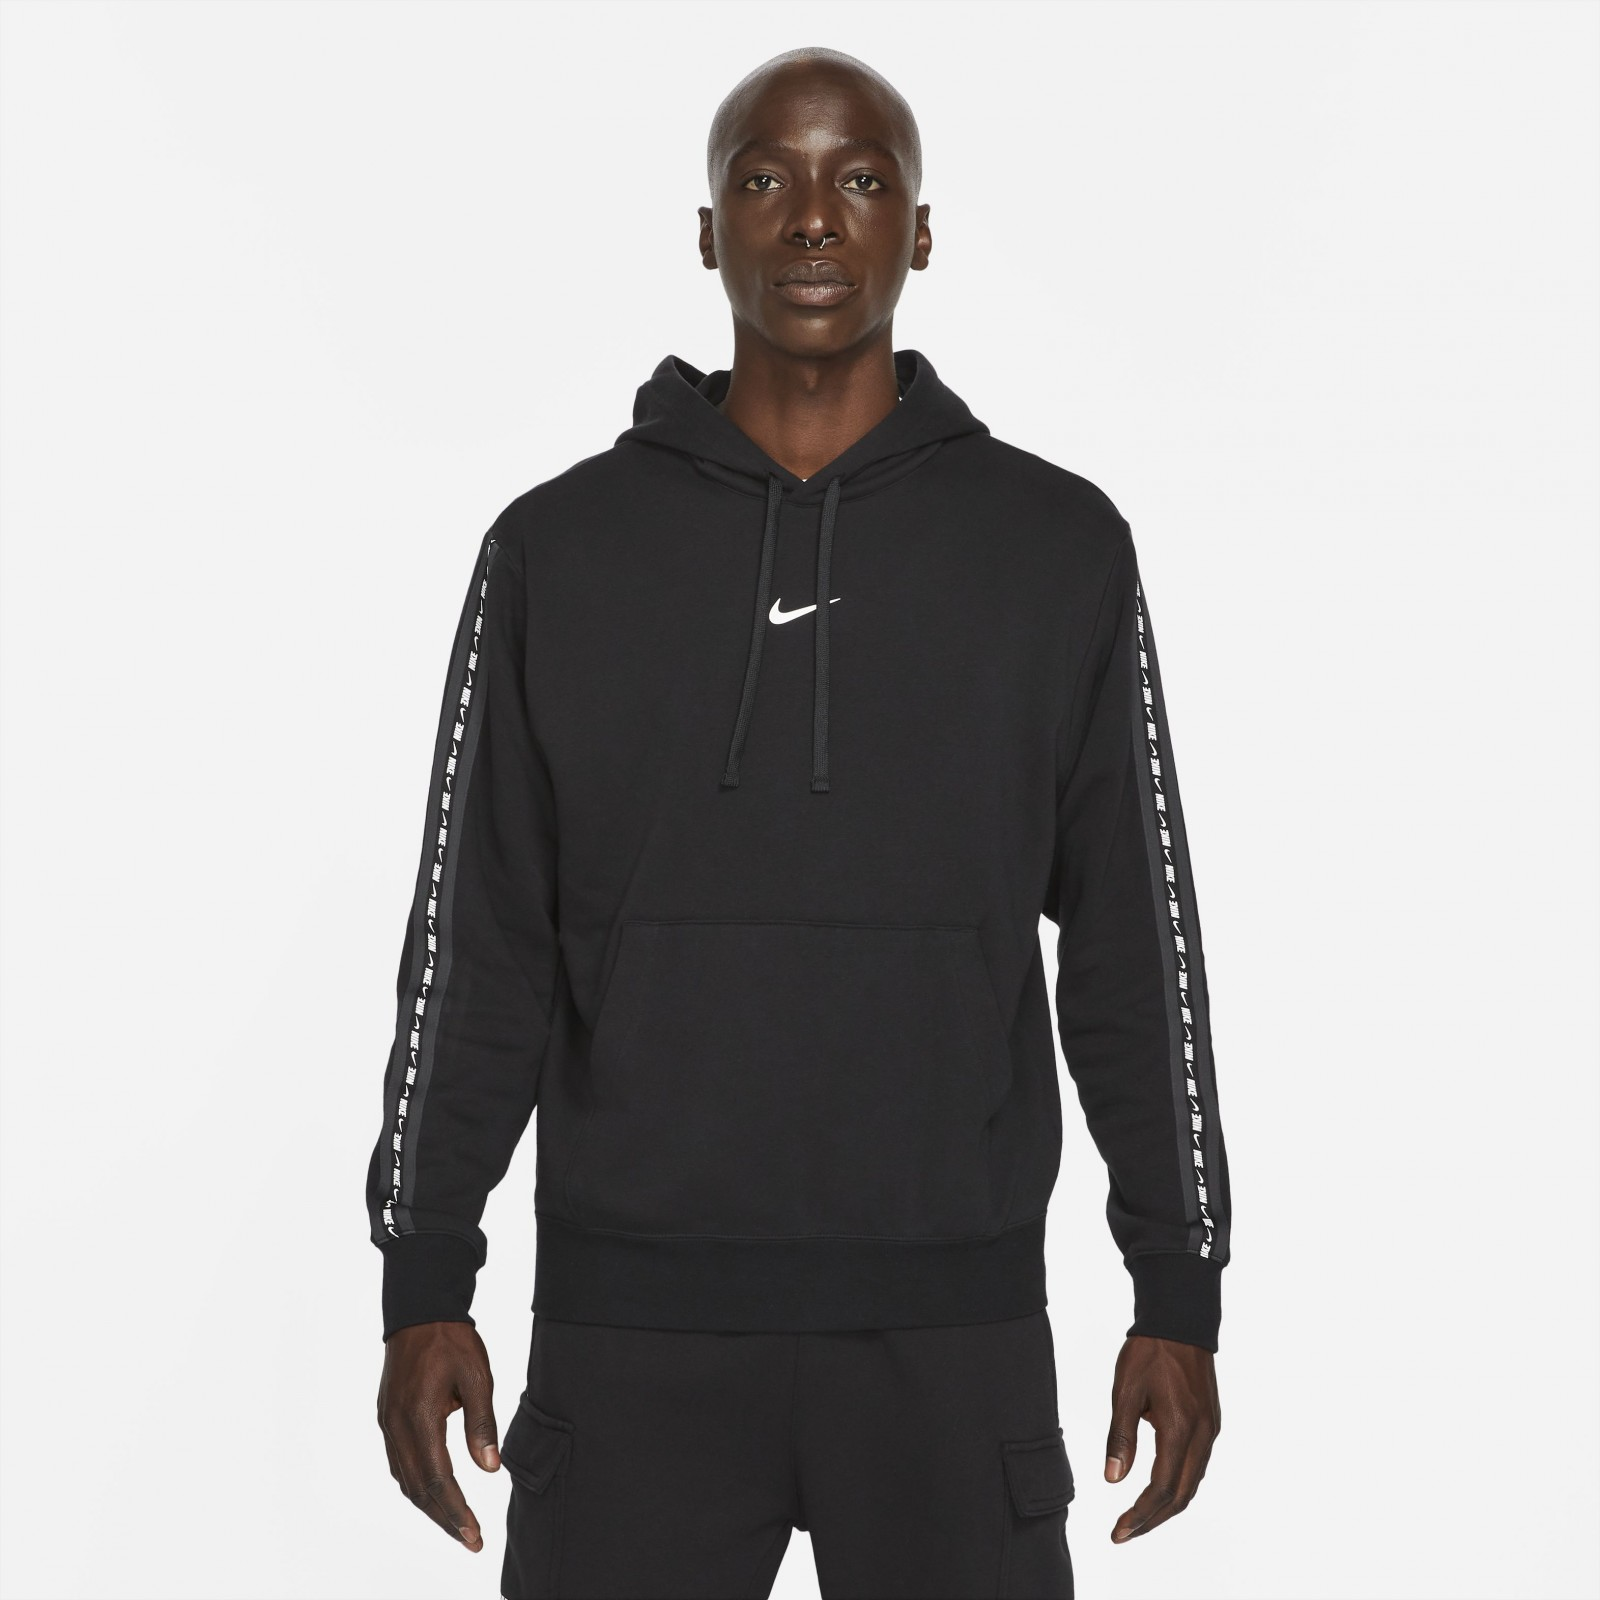 M nsw repeat flc po hoodie bb BLACK